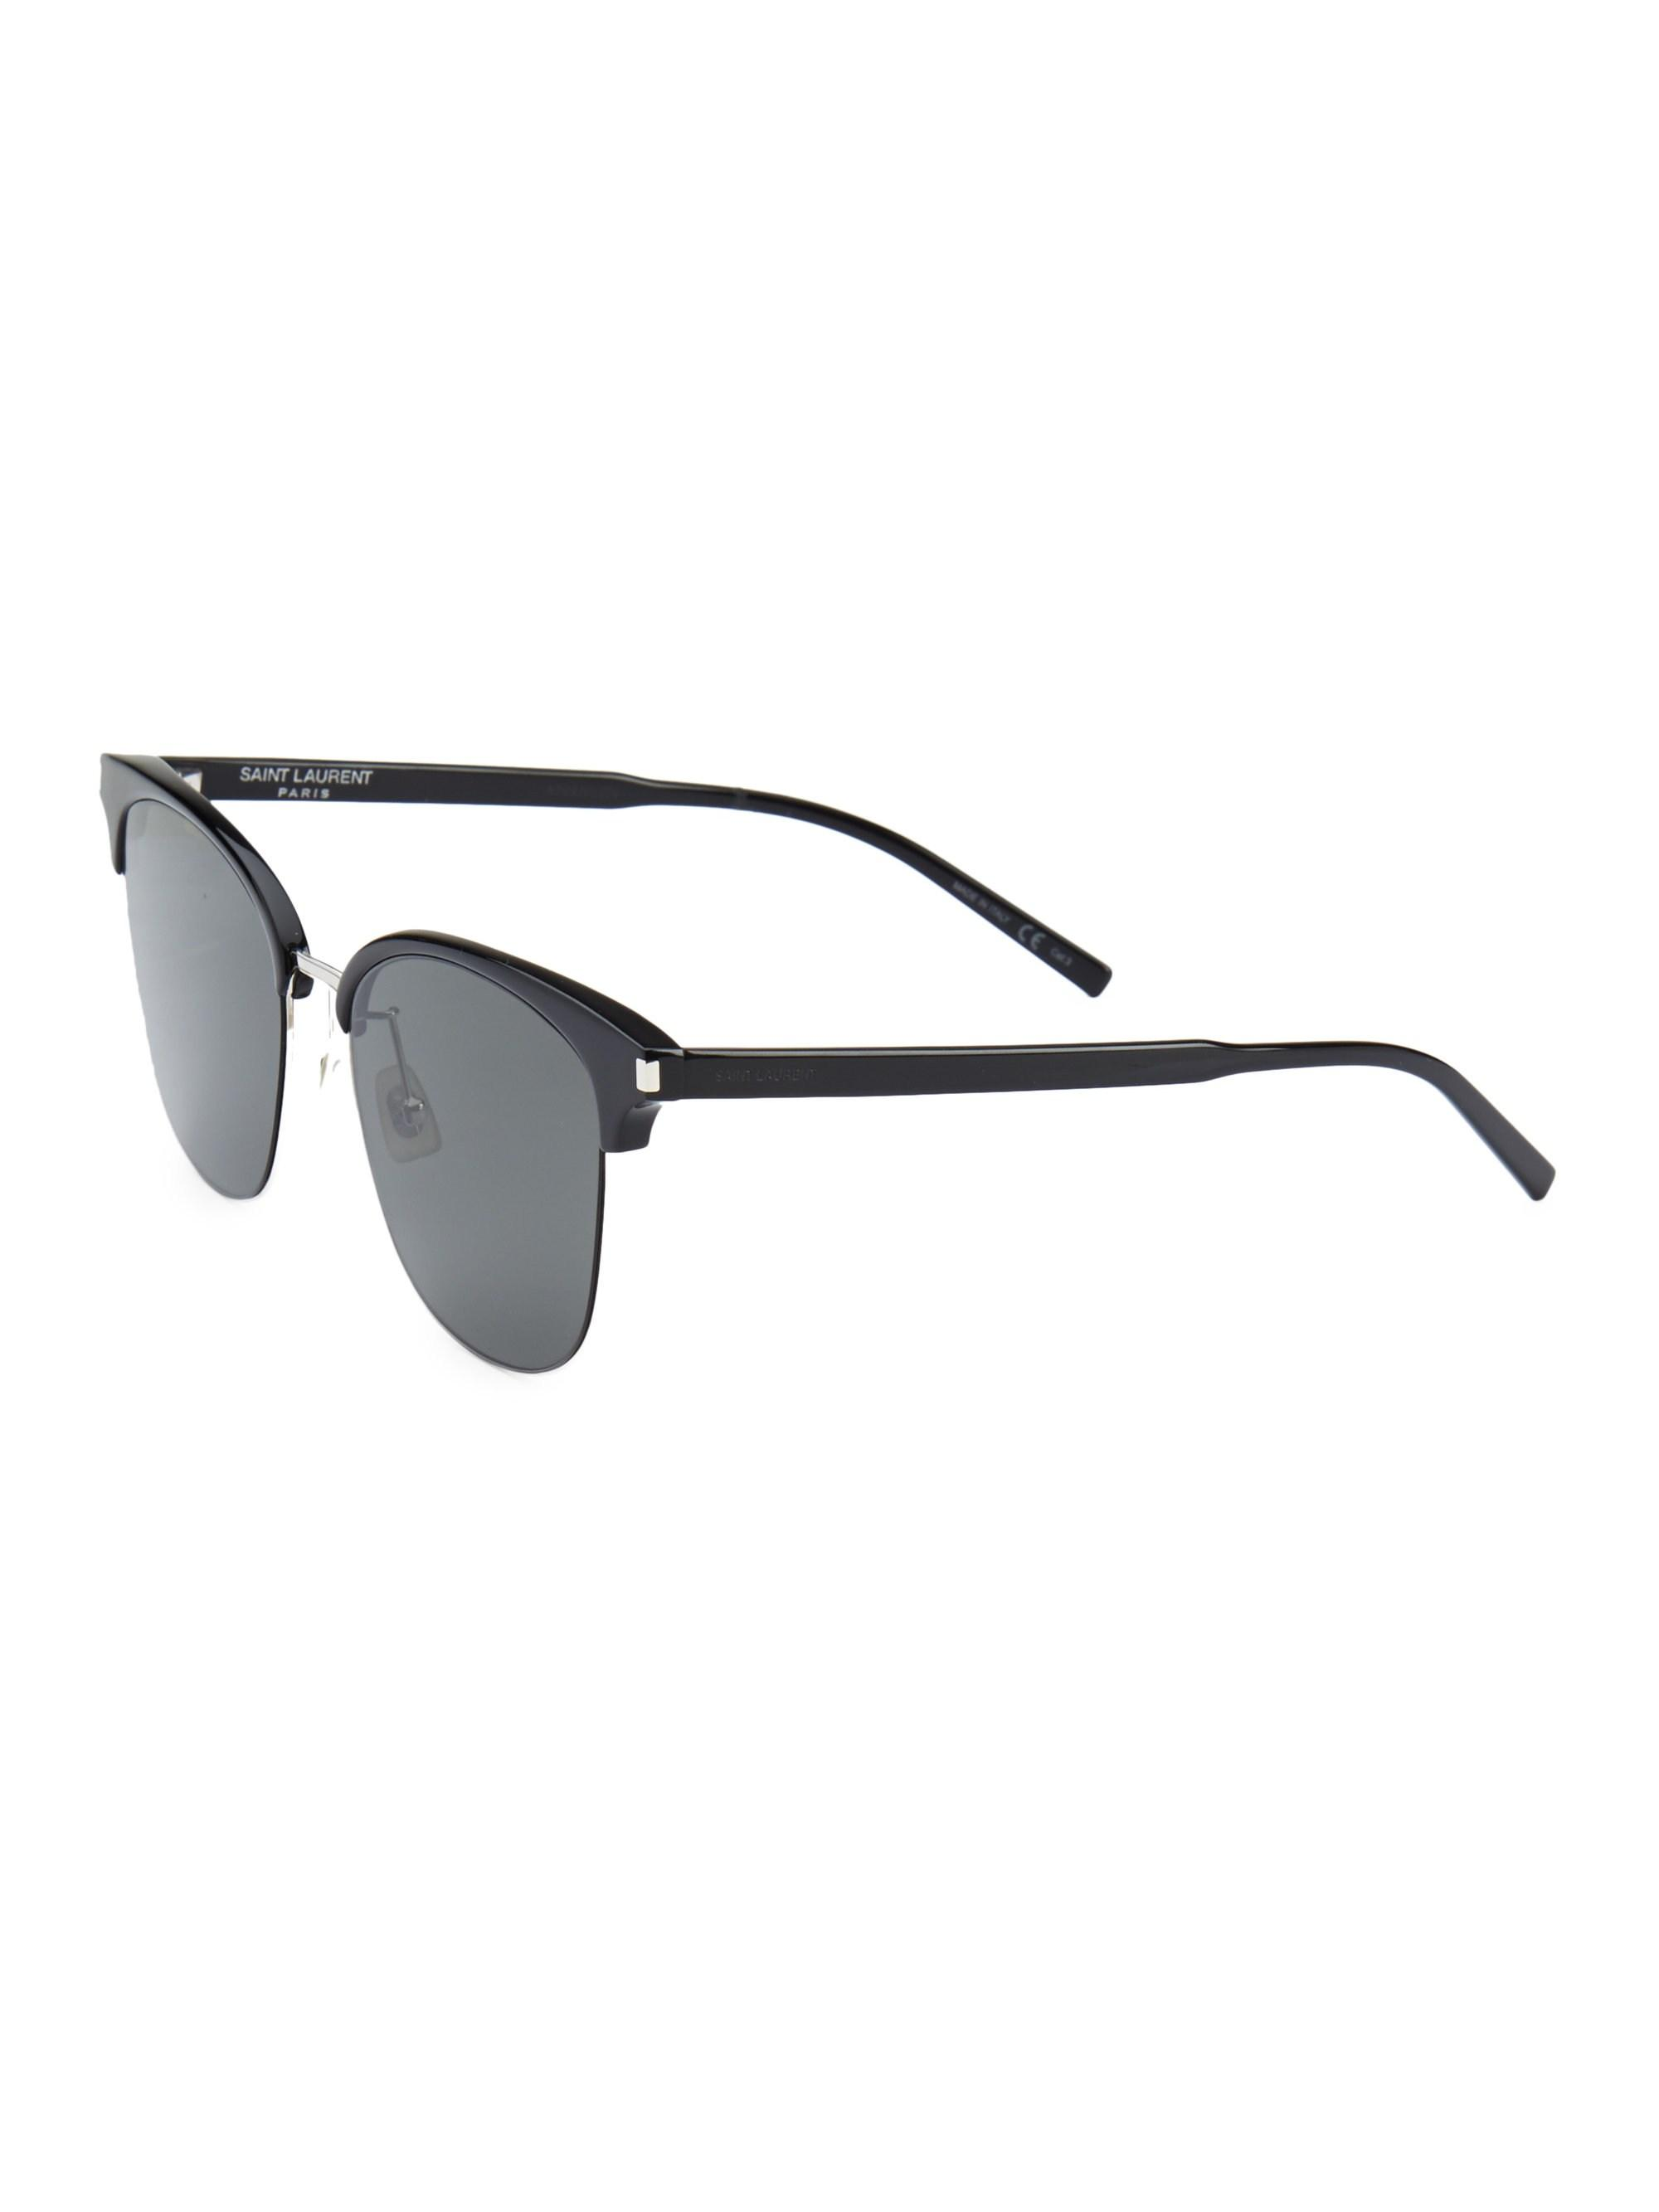 839b142734 Saint Laurent - Men s 57mm Clubmaster Sunglasses - Black Silver for Men -  Lyst. View fullscreen